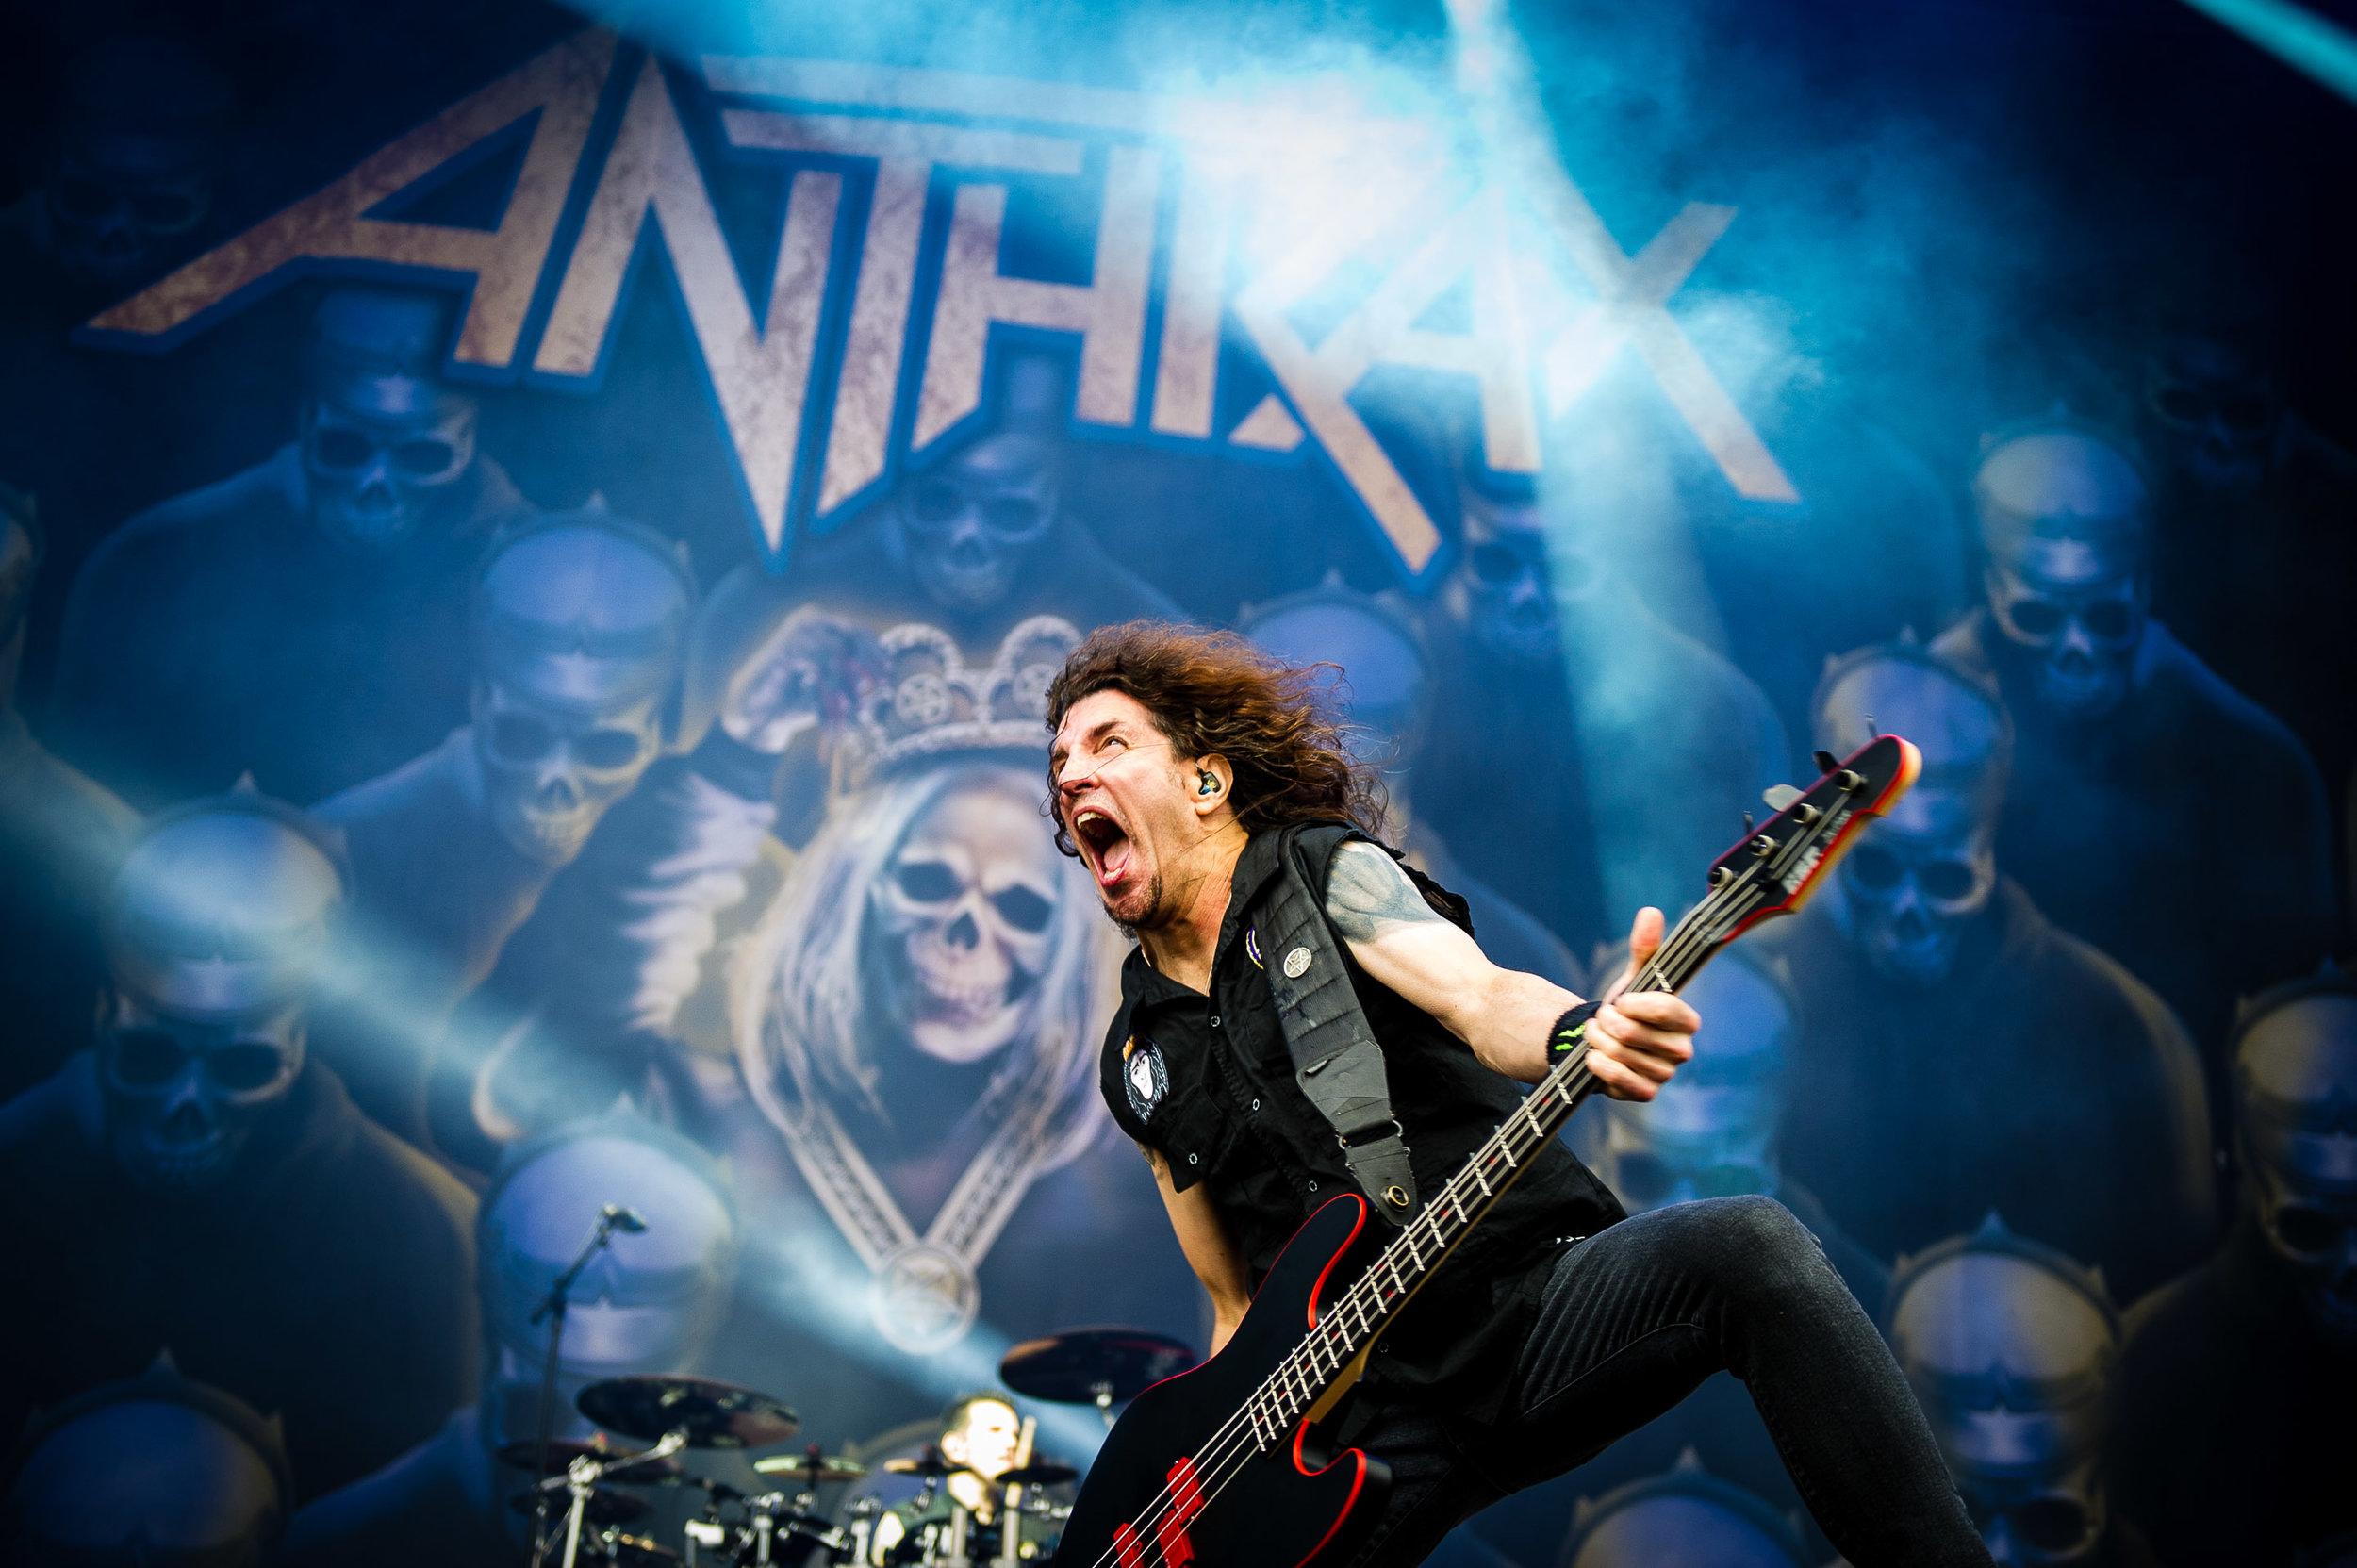 anthrax_download_sydney_07.jpg